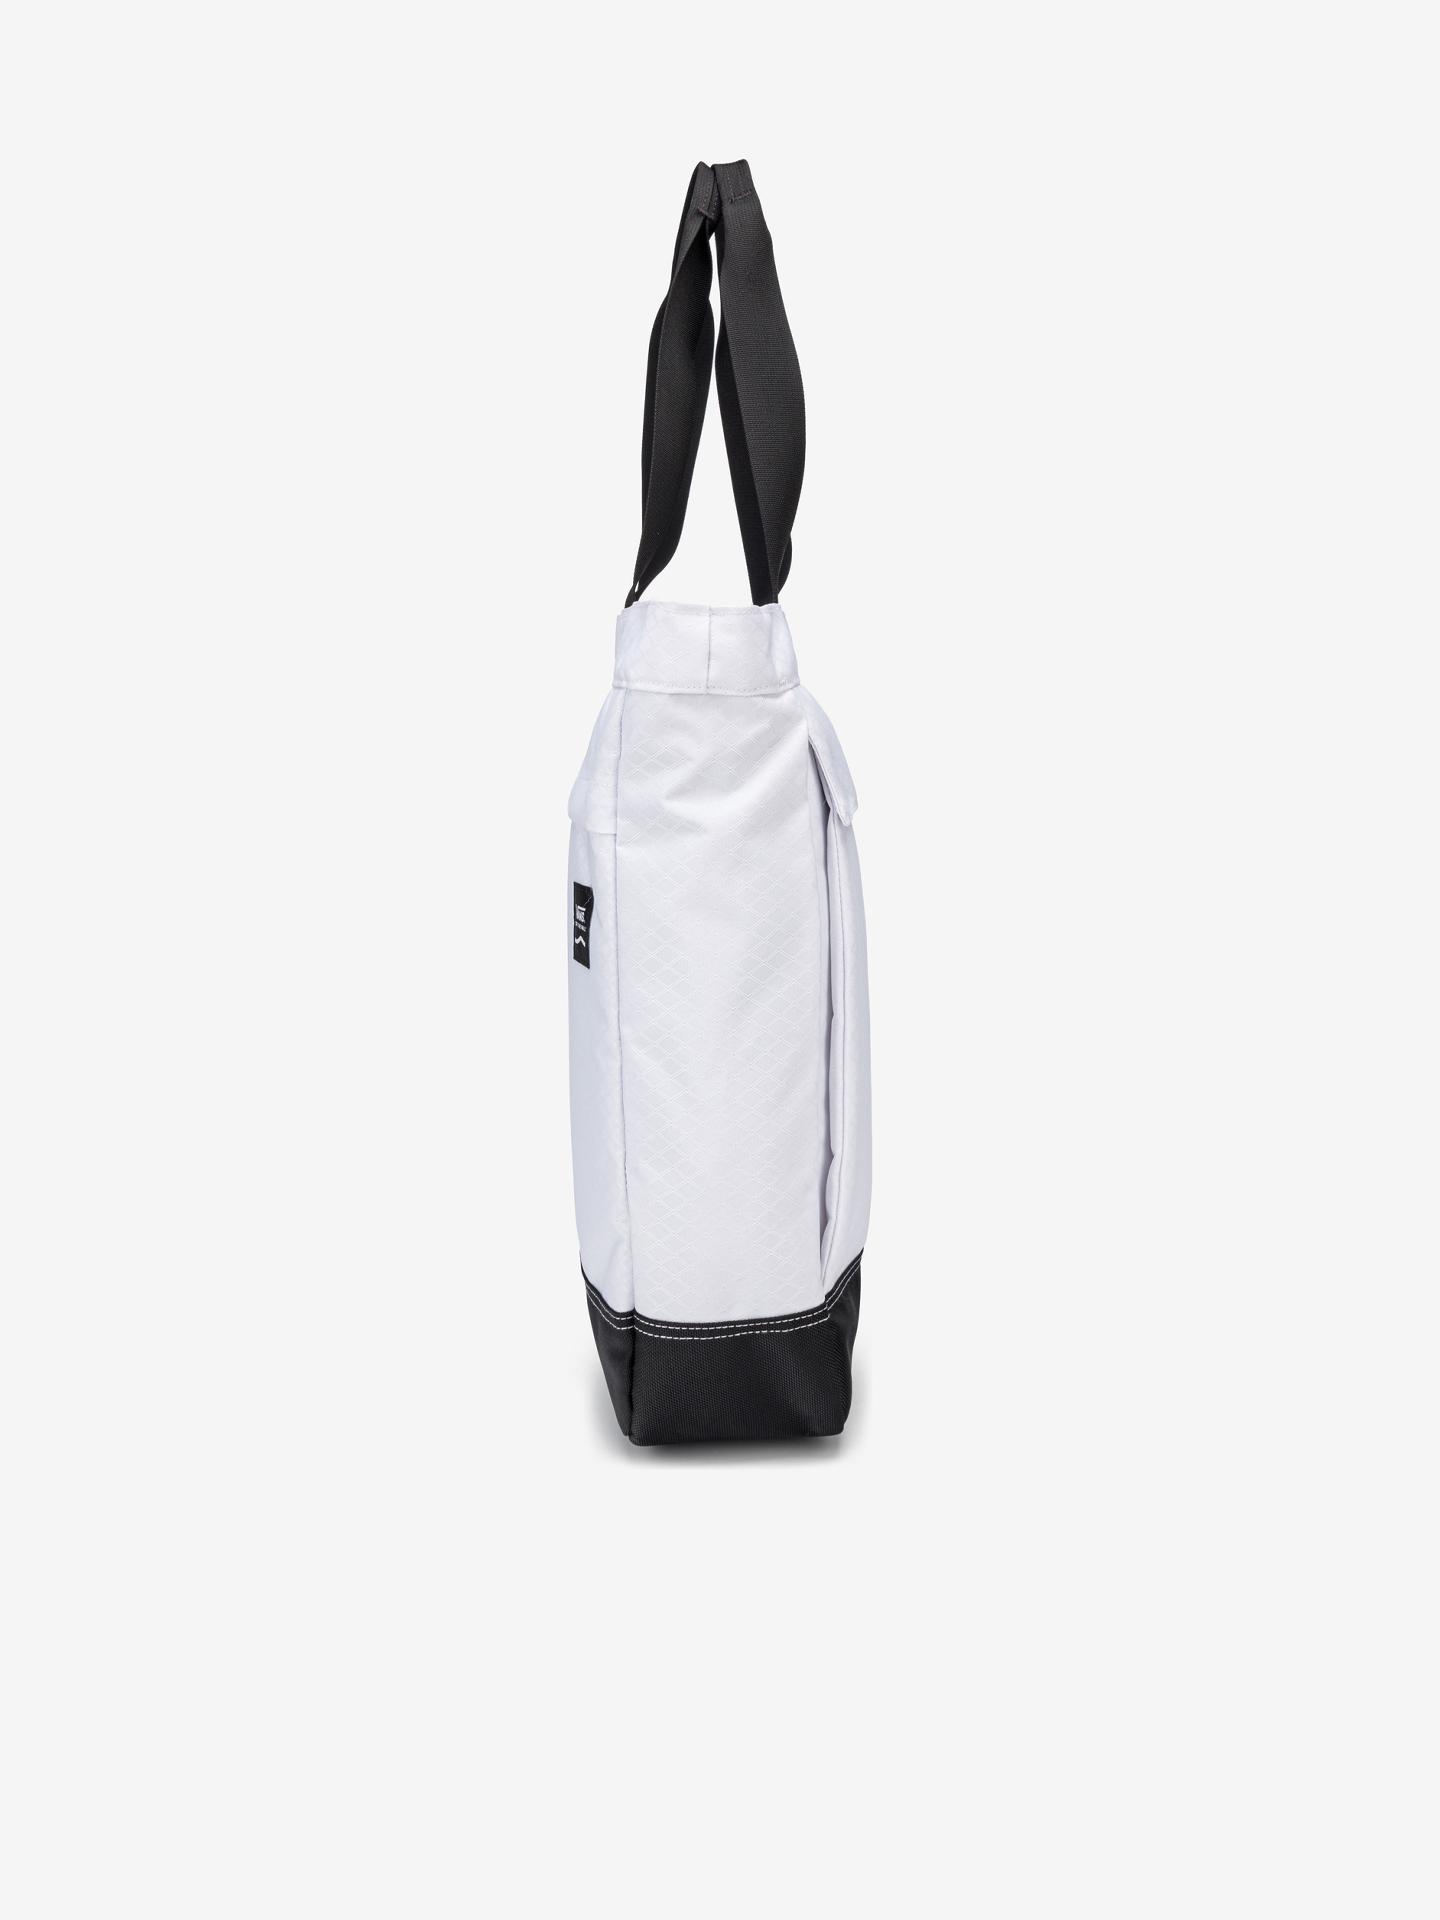 Vans biały torba Construct